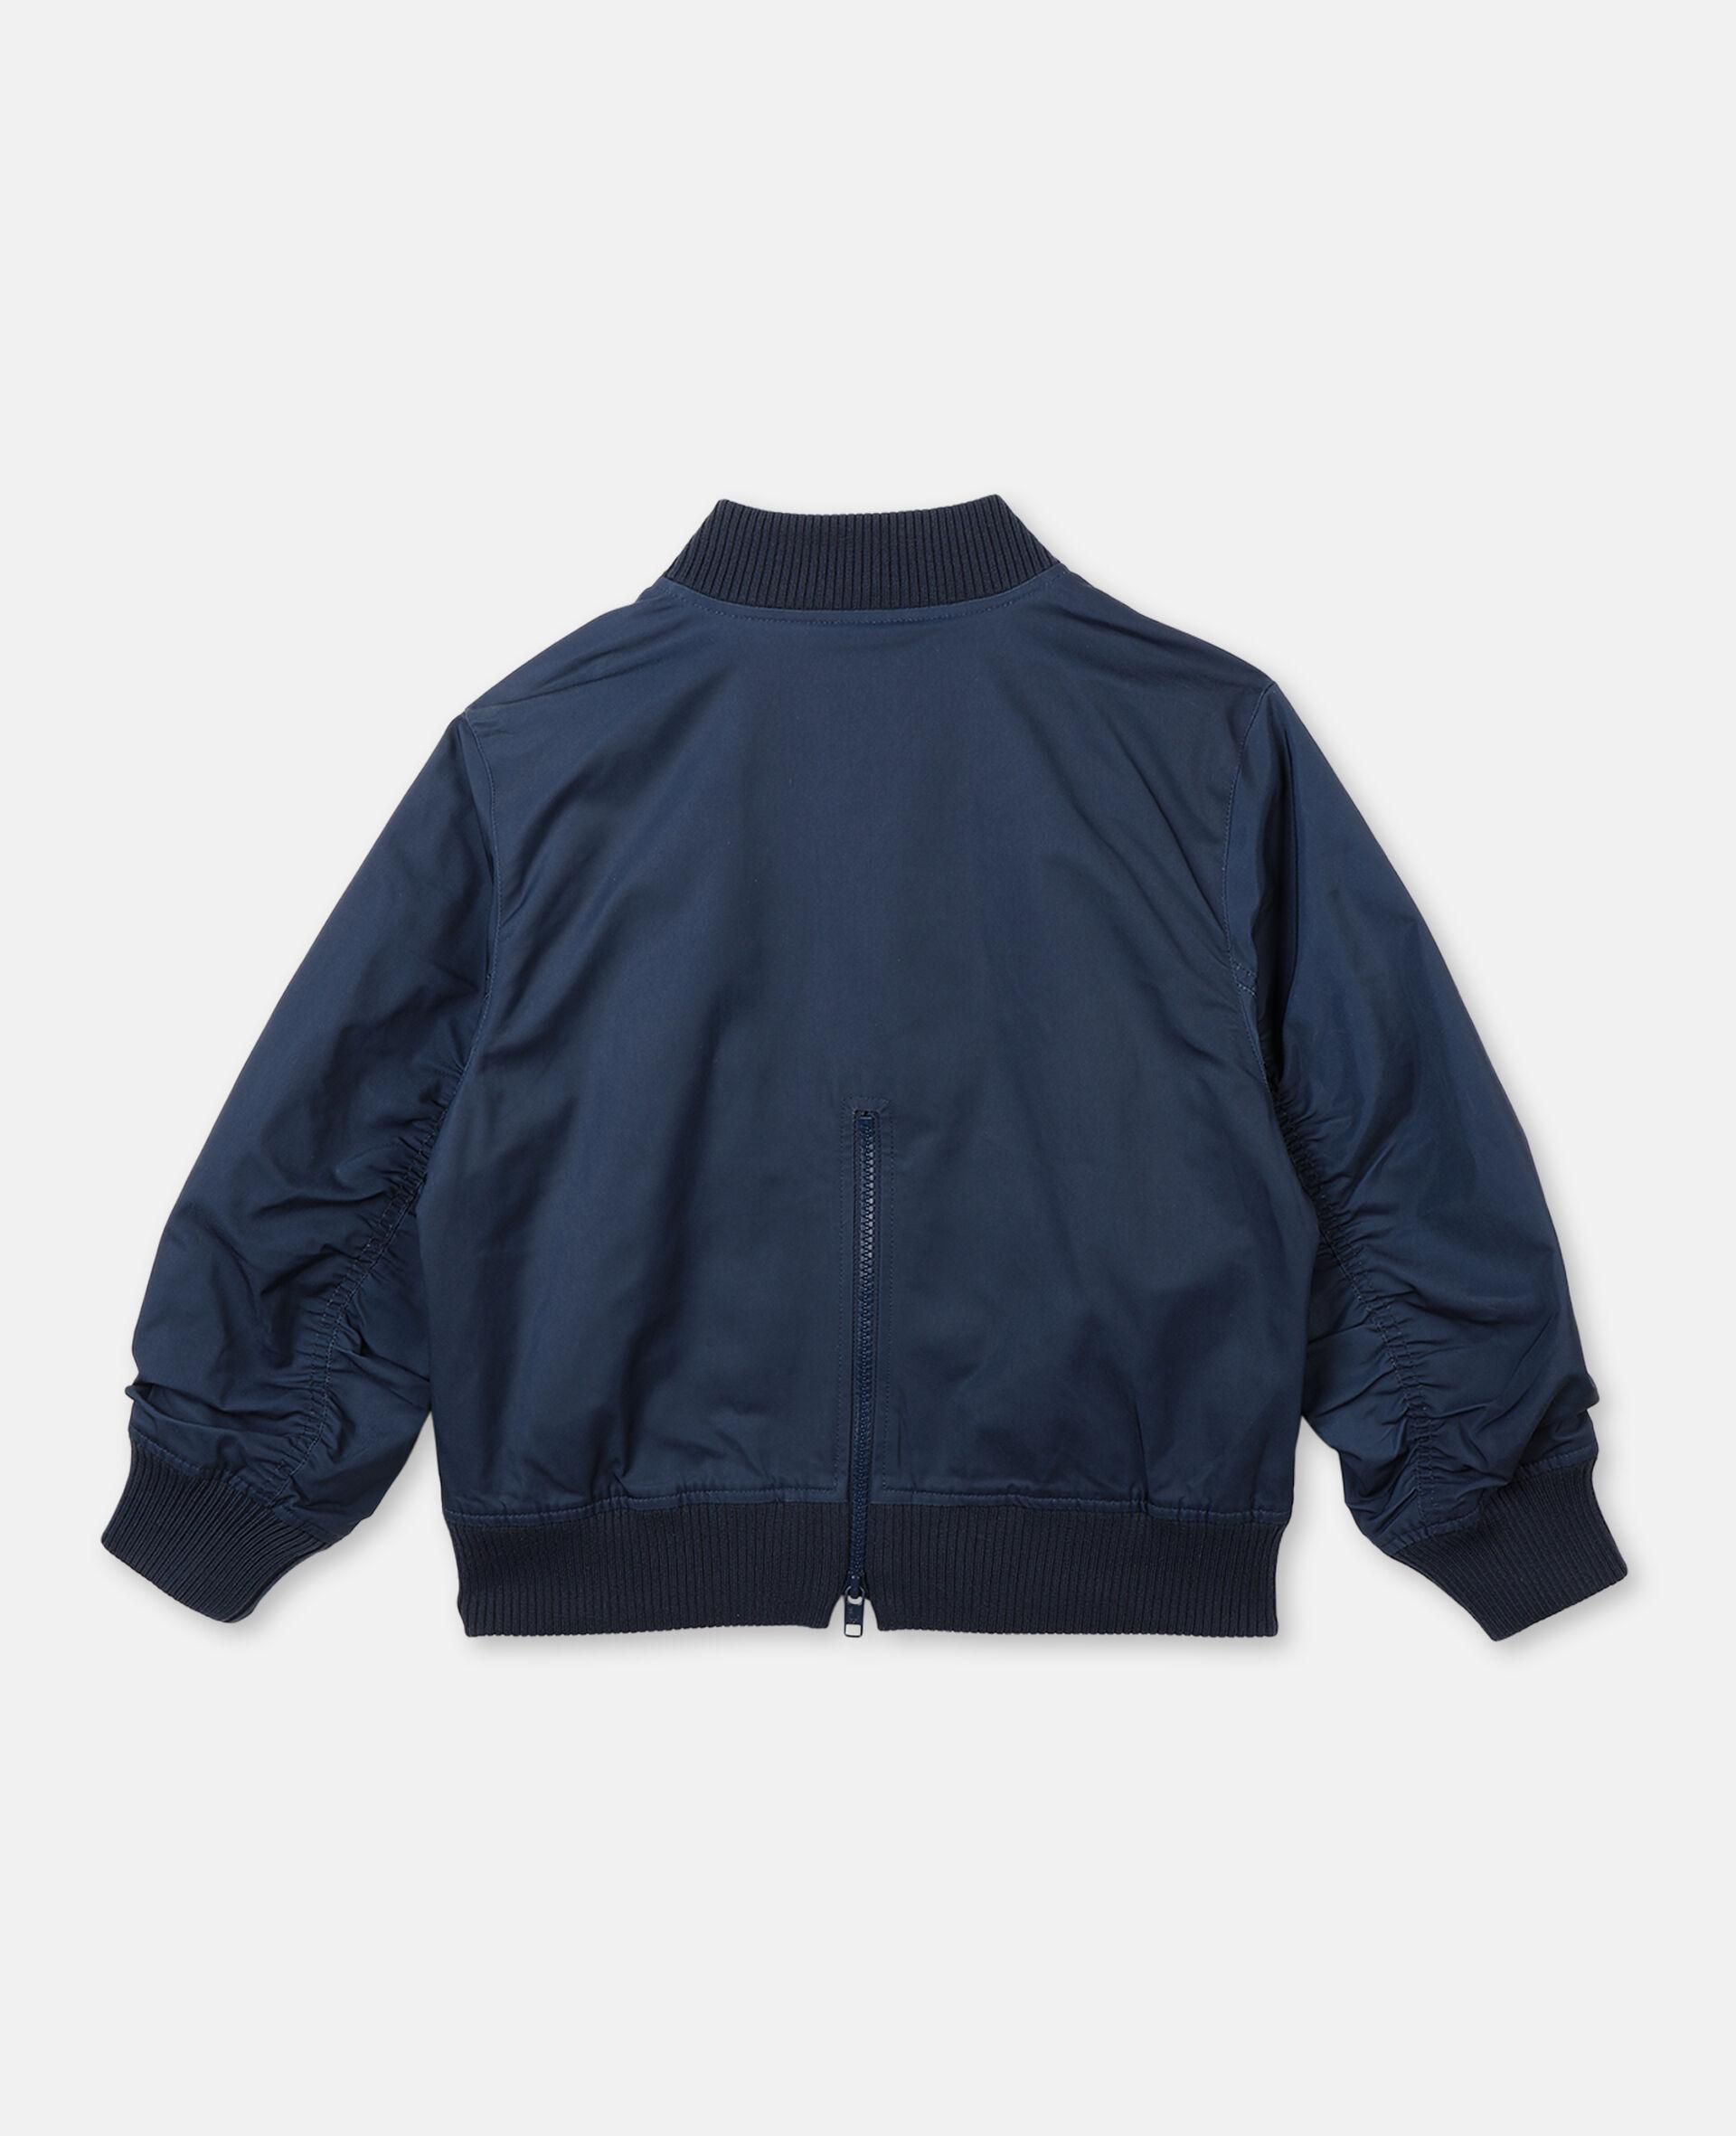 Jacke mit Palmen-Stickerei -Blau-large image number 3